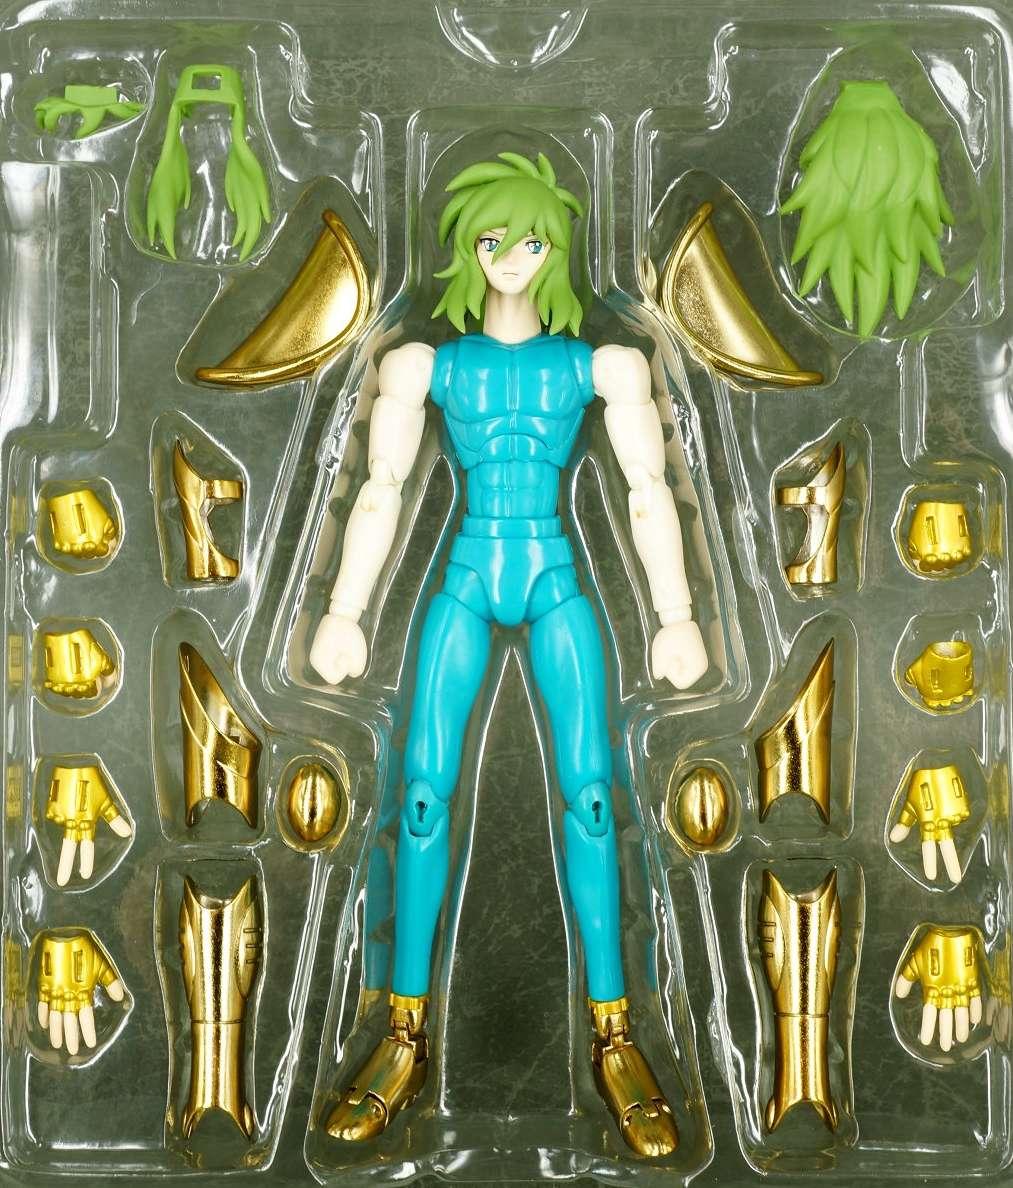 Andromeda Shun V1 Limited Gold - Toei Web Shop -